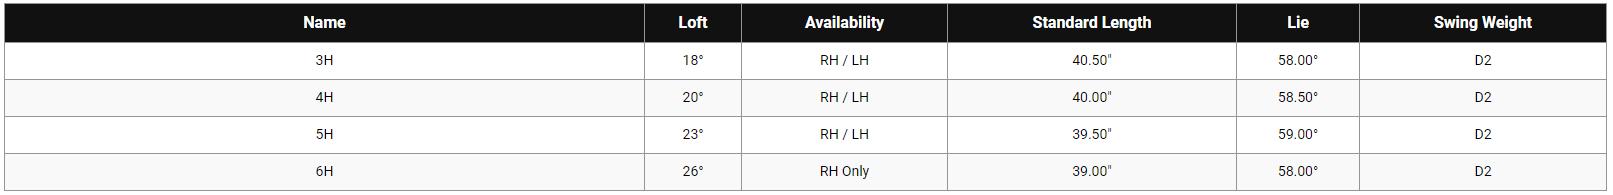 Callaway Mavrik Hybrid Tech Specs